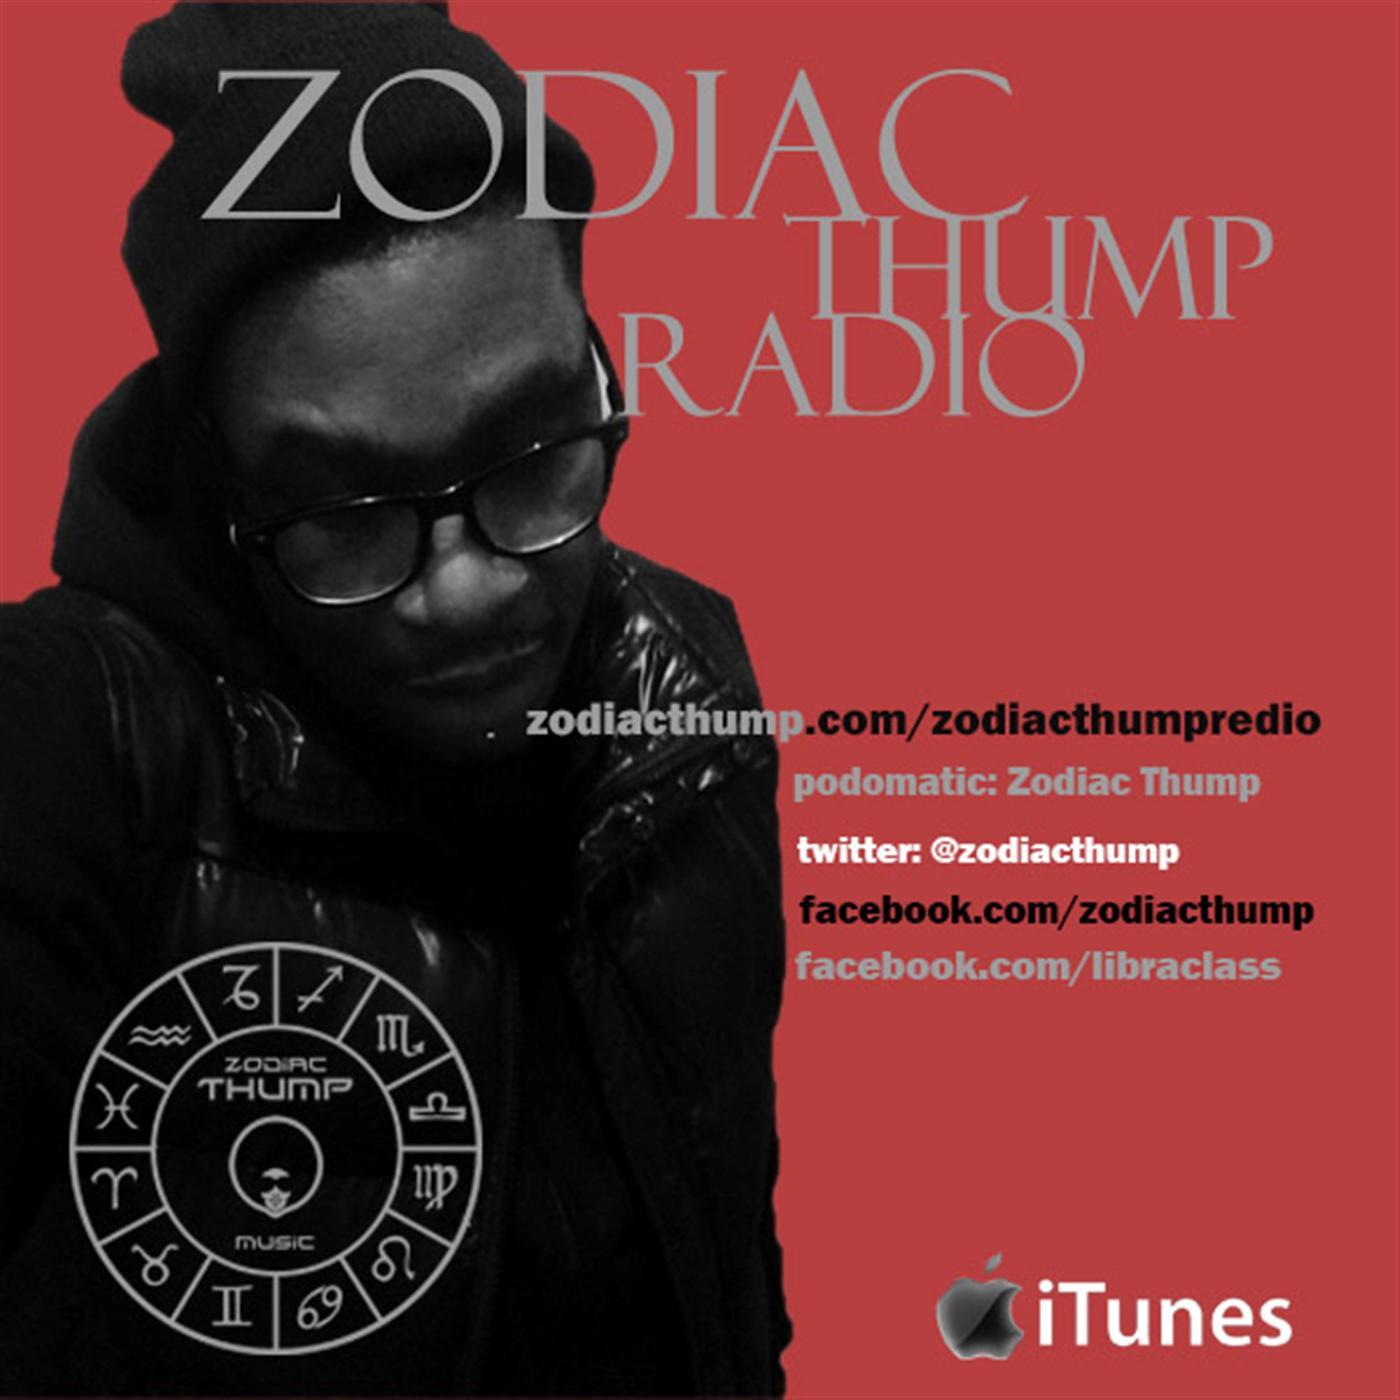 Zodiac THUMP Radio!